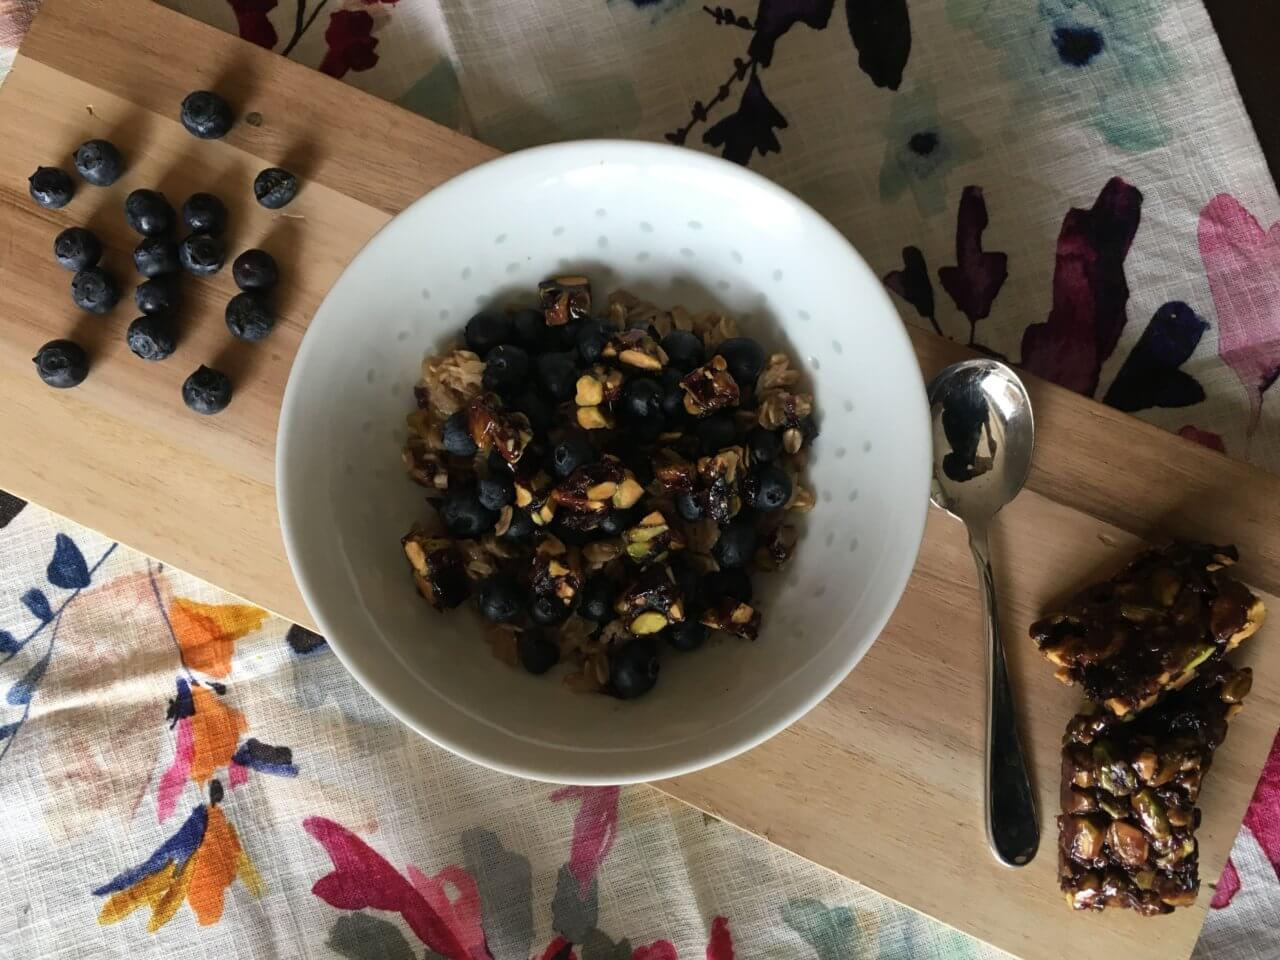 Pistachio-Blueberry-Oatmeal-min-1280x960.jpg